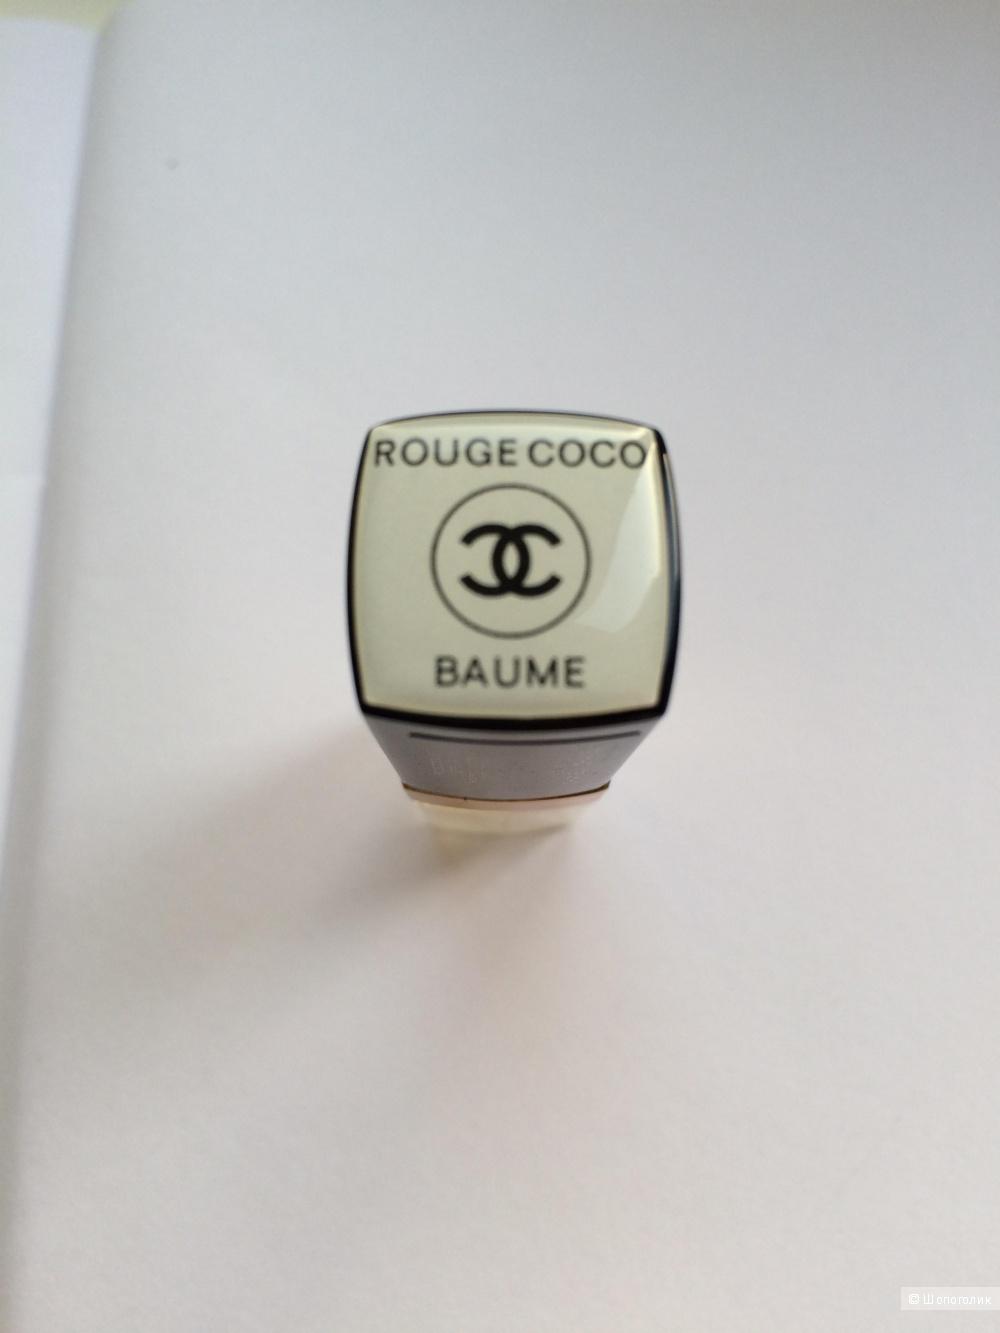 CHANEL ROUGE COCO BAUME увлажняющий и восстанавливающий бальзам для губ